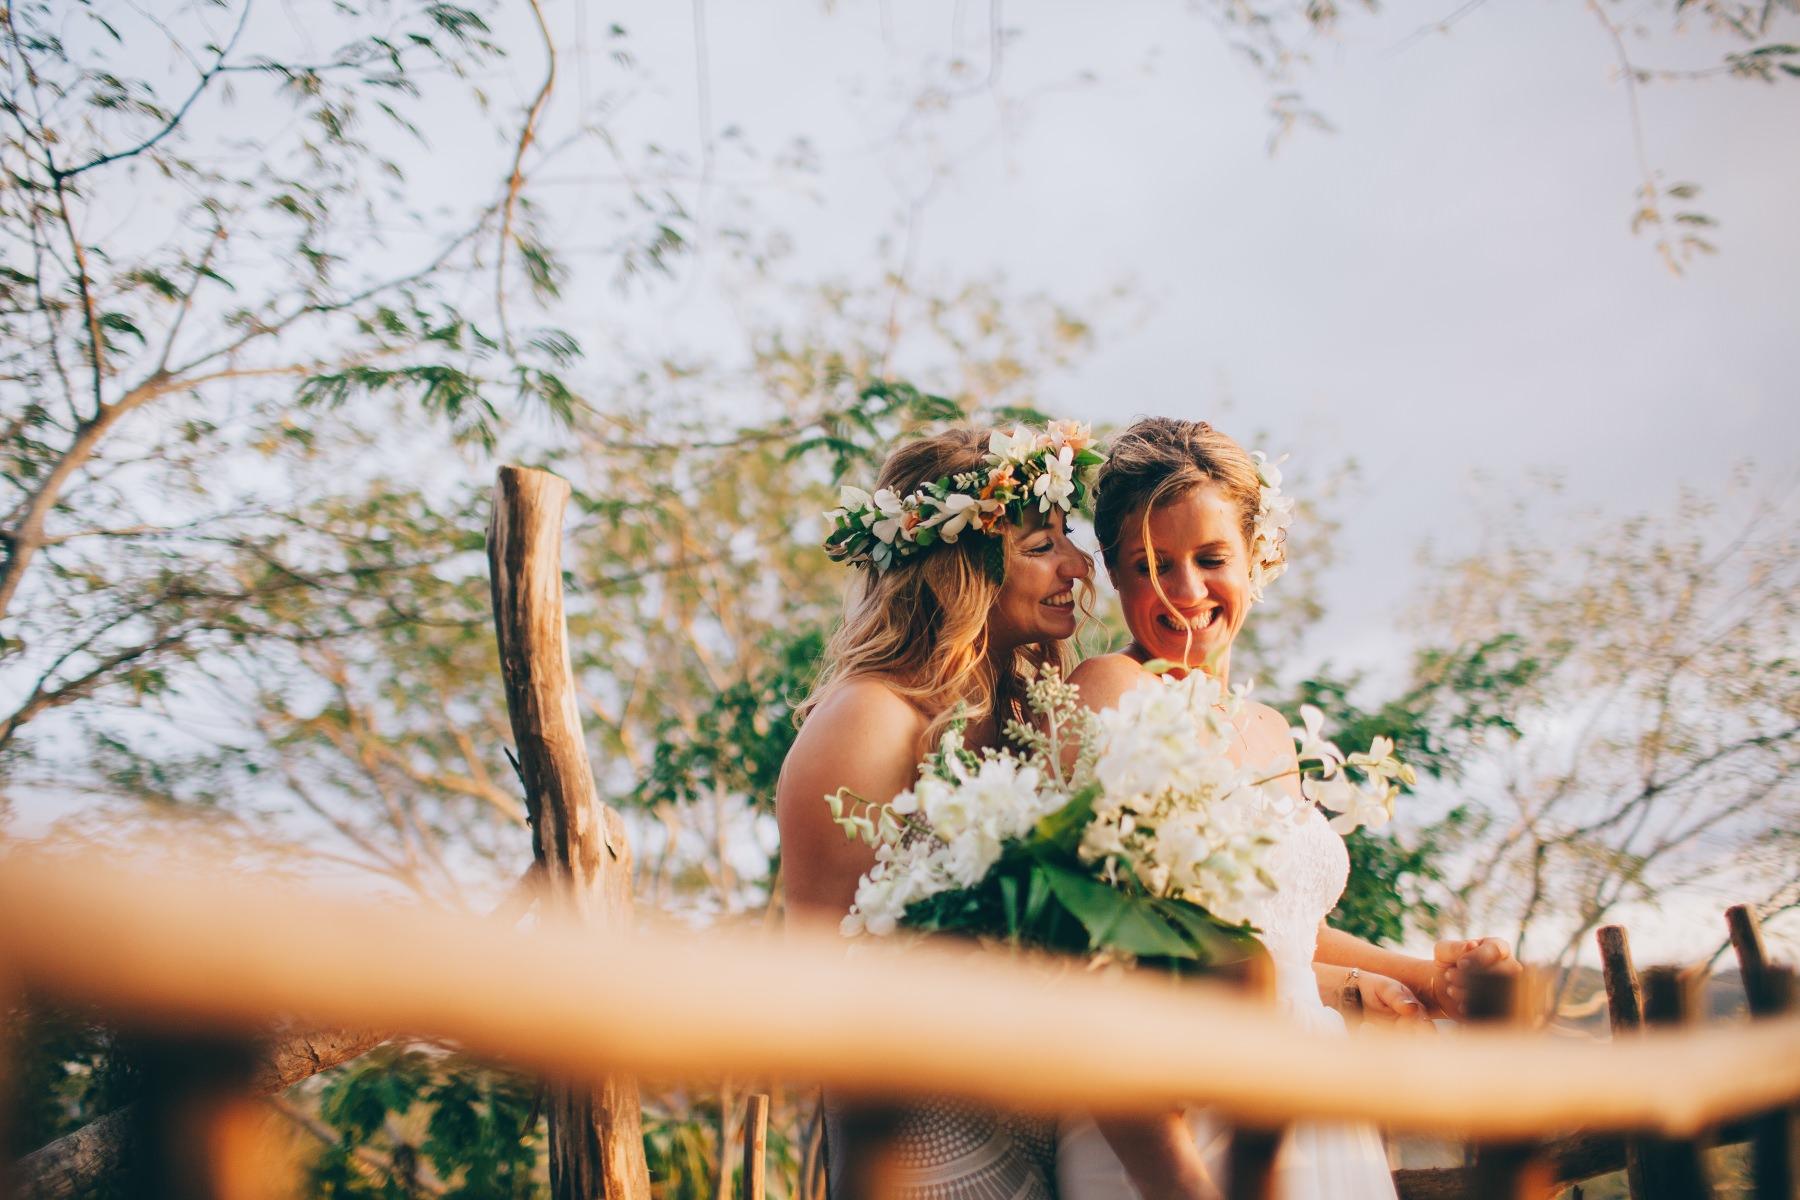 Beautiful brides photography - same-sex destination wedding Costa Rica